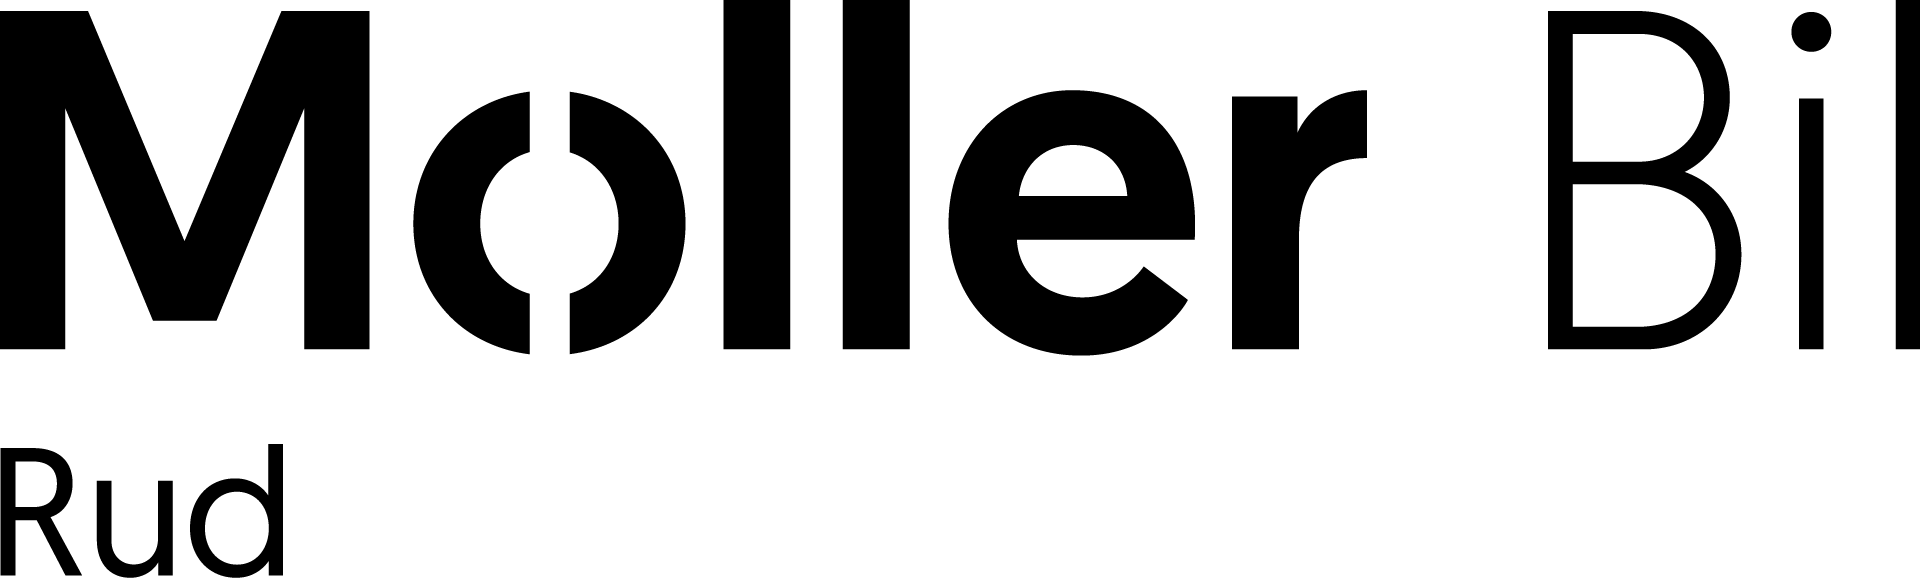 MollerBil